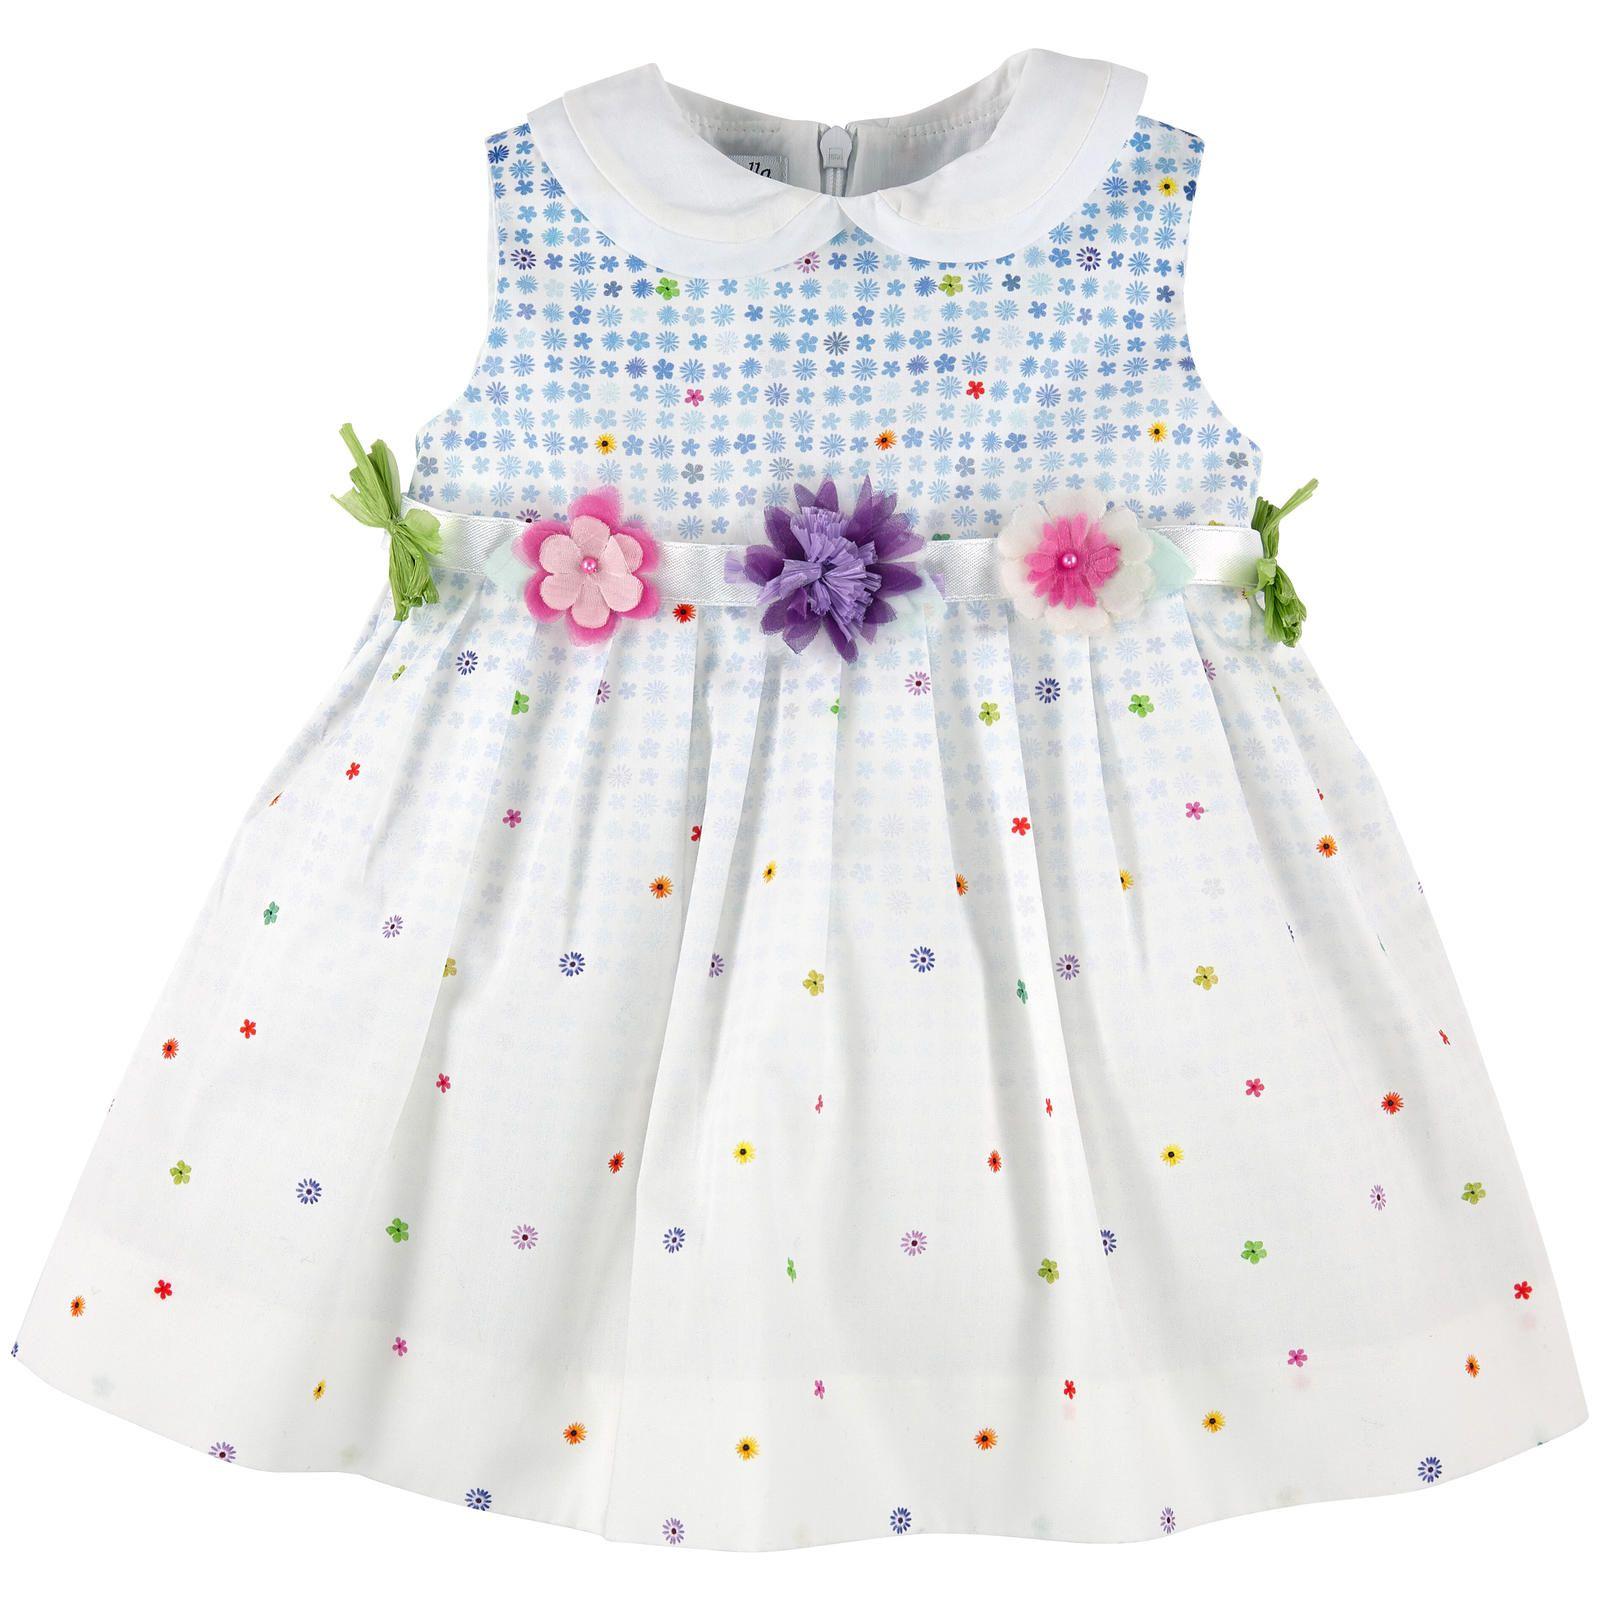 Baby Graziella Dresses Dress oooh baby baby